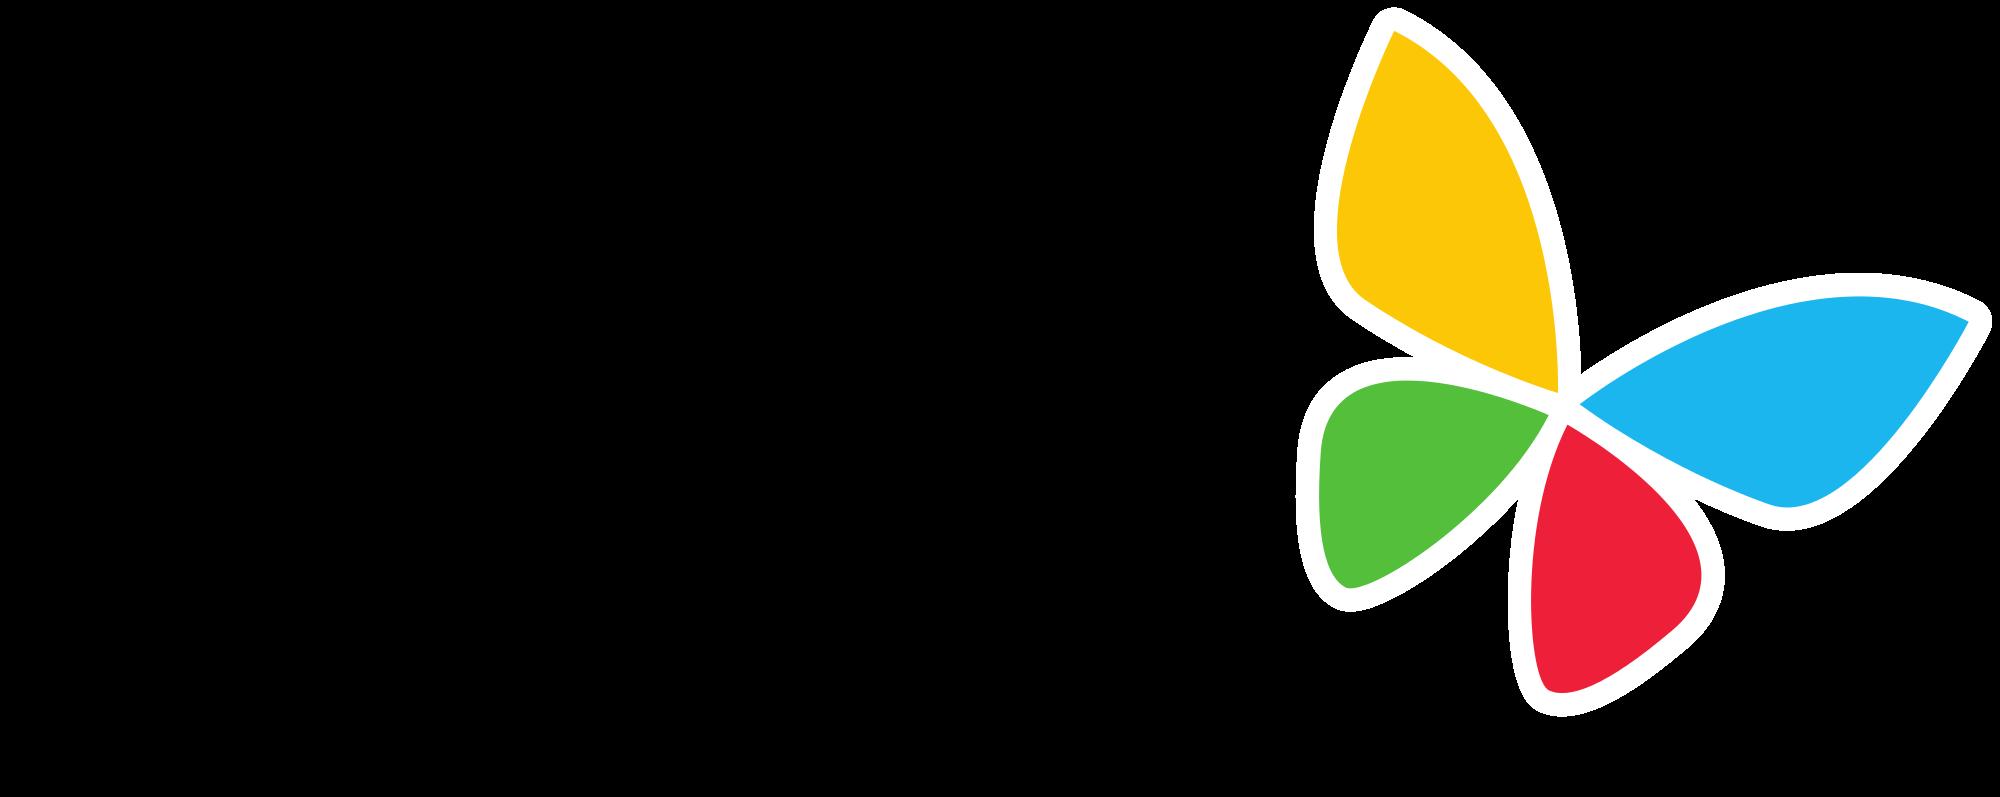 Childrens_Hospital_Los_Angeles_Logo.png